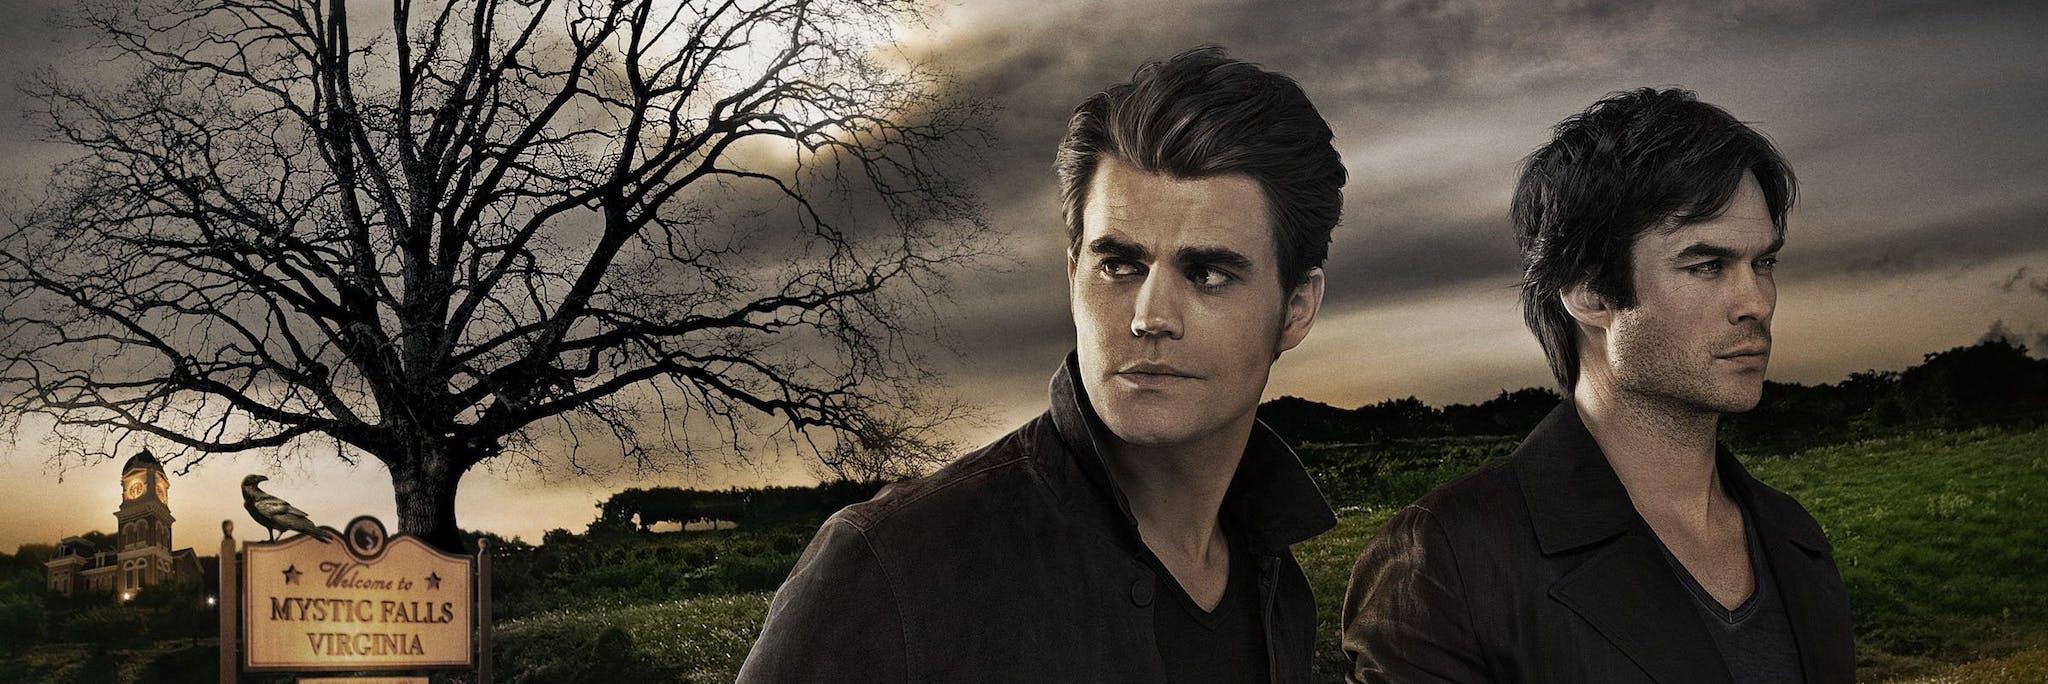 O2tvseries supernatural season 10 - Seth and summer moments season 1